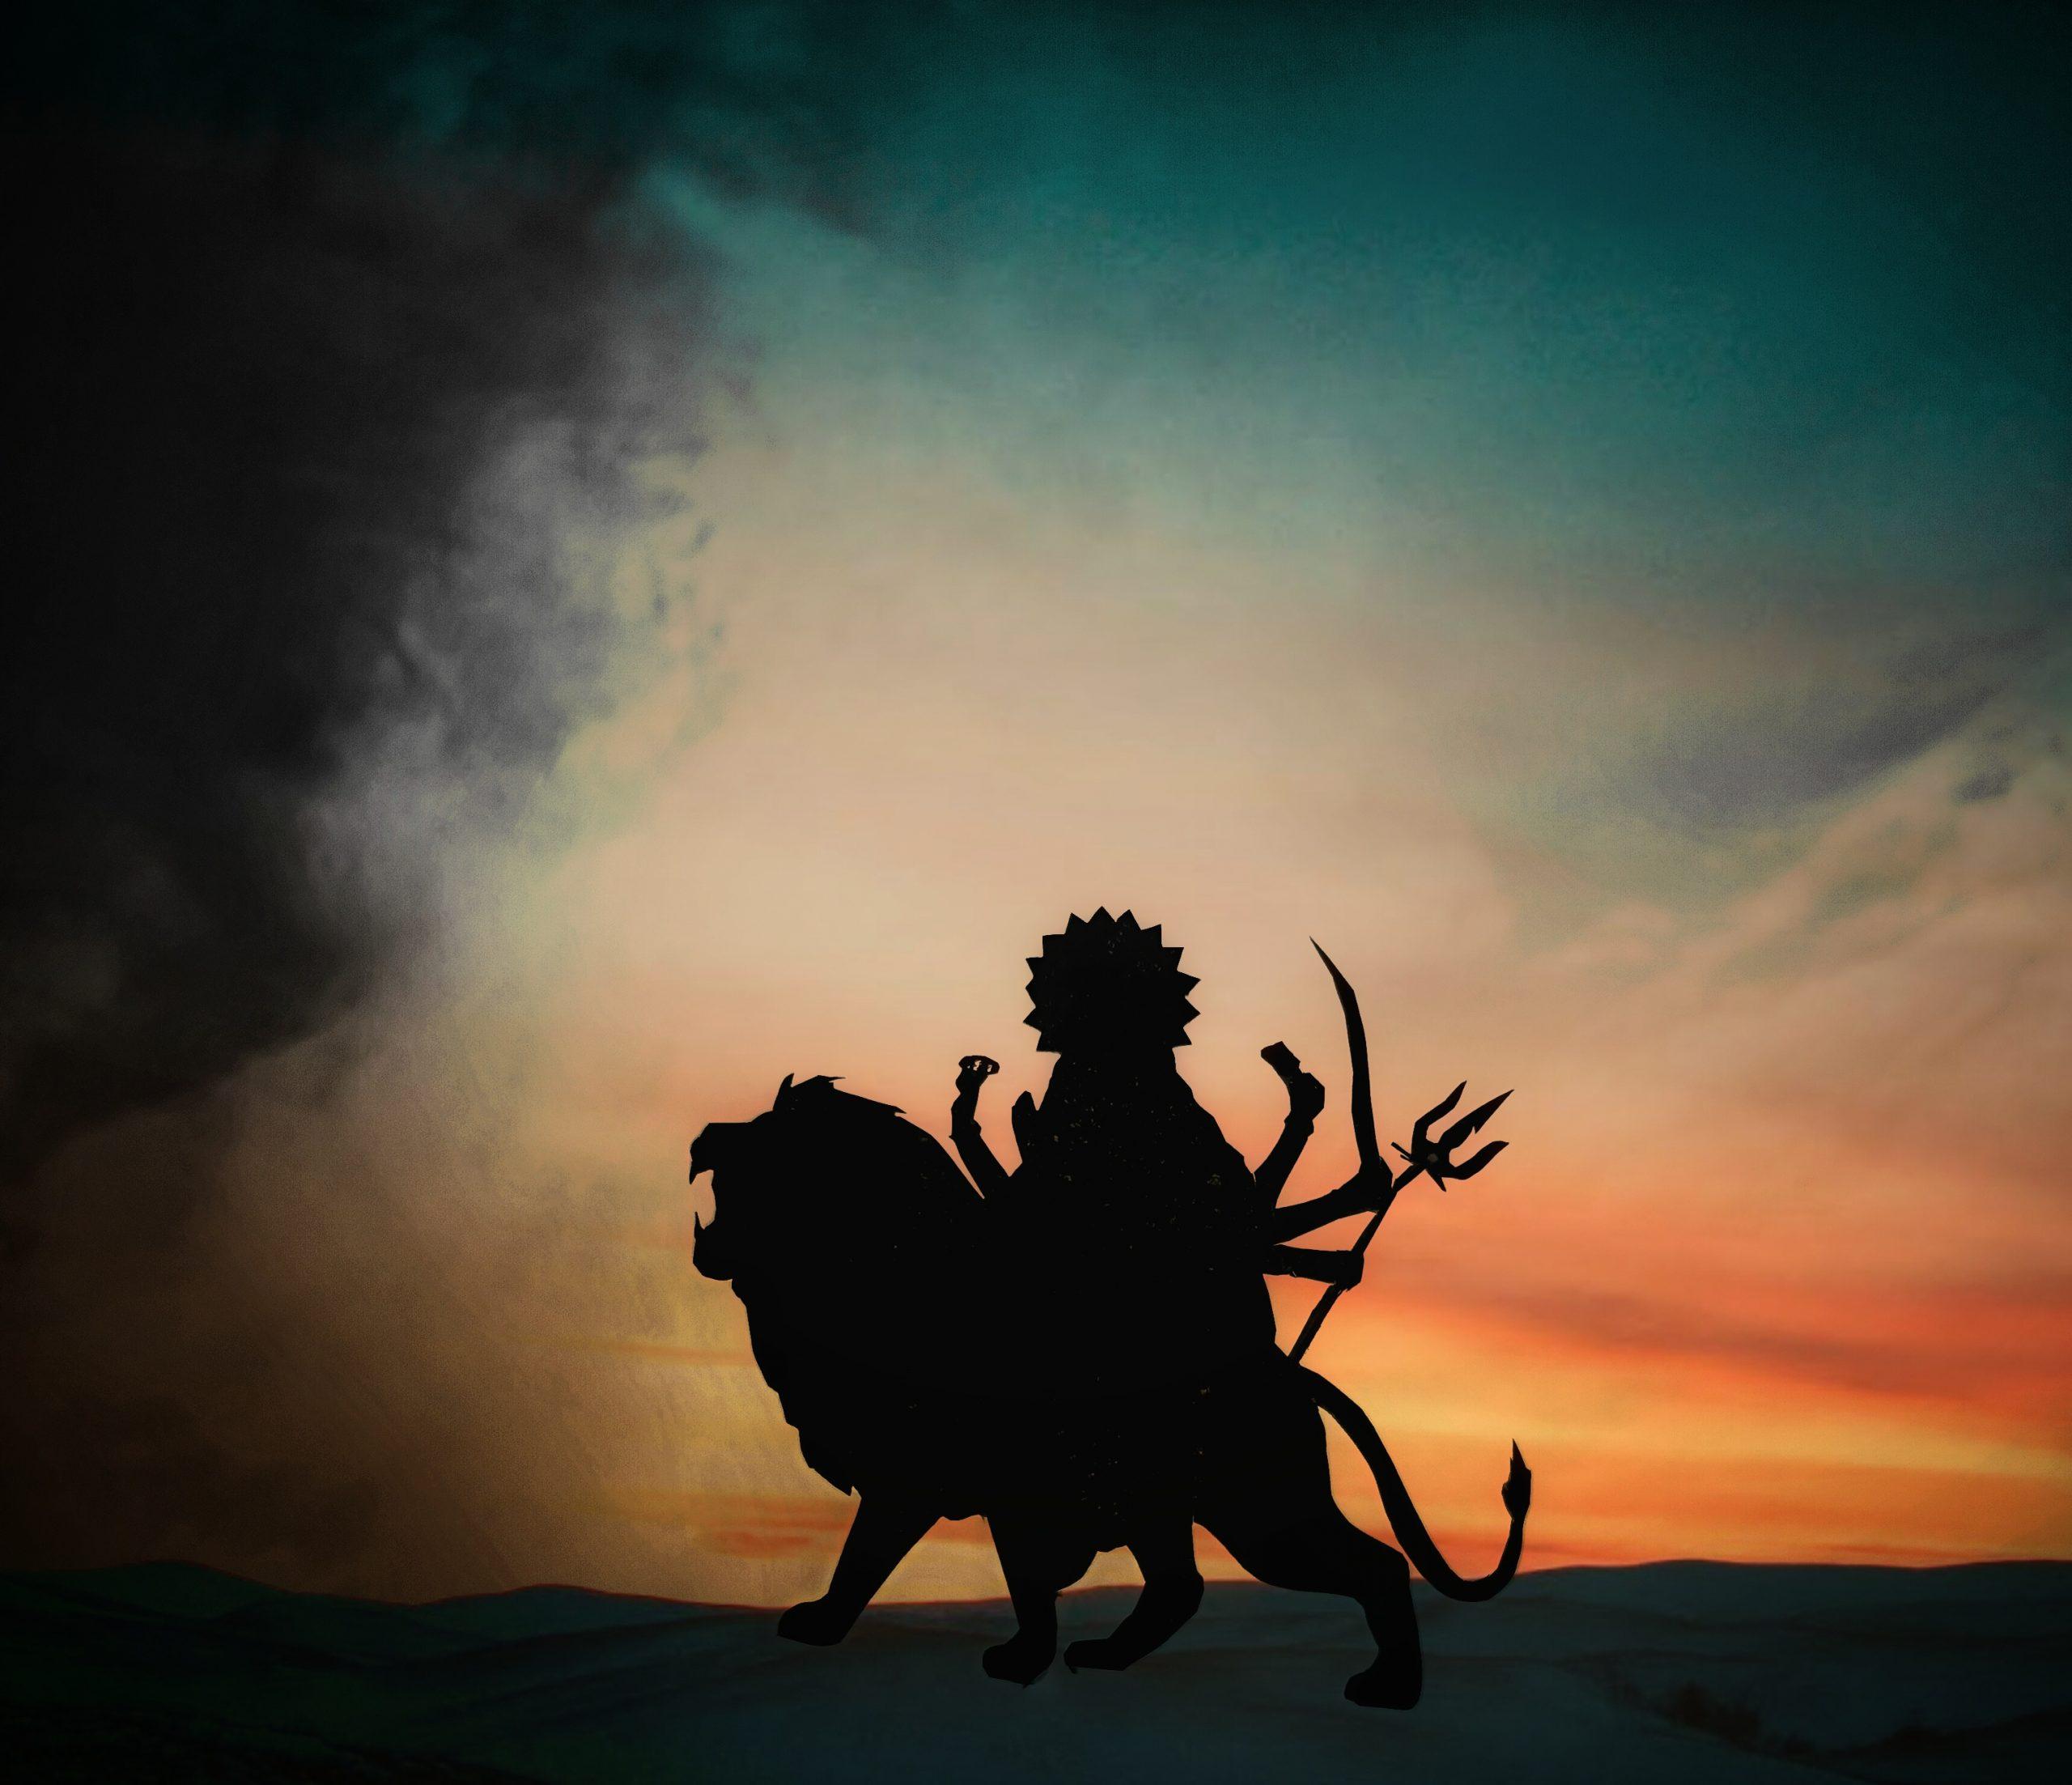 Goddess Durga idol in darkness